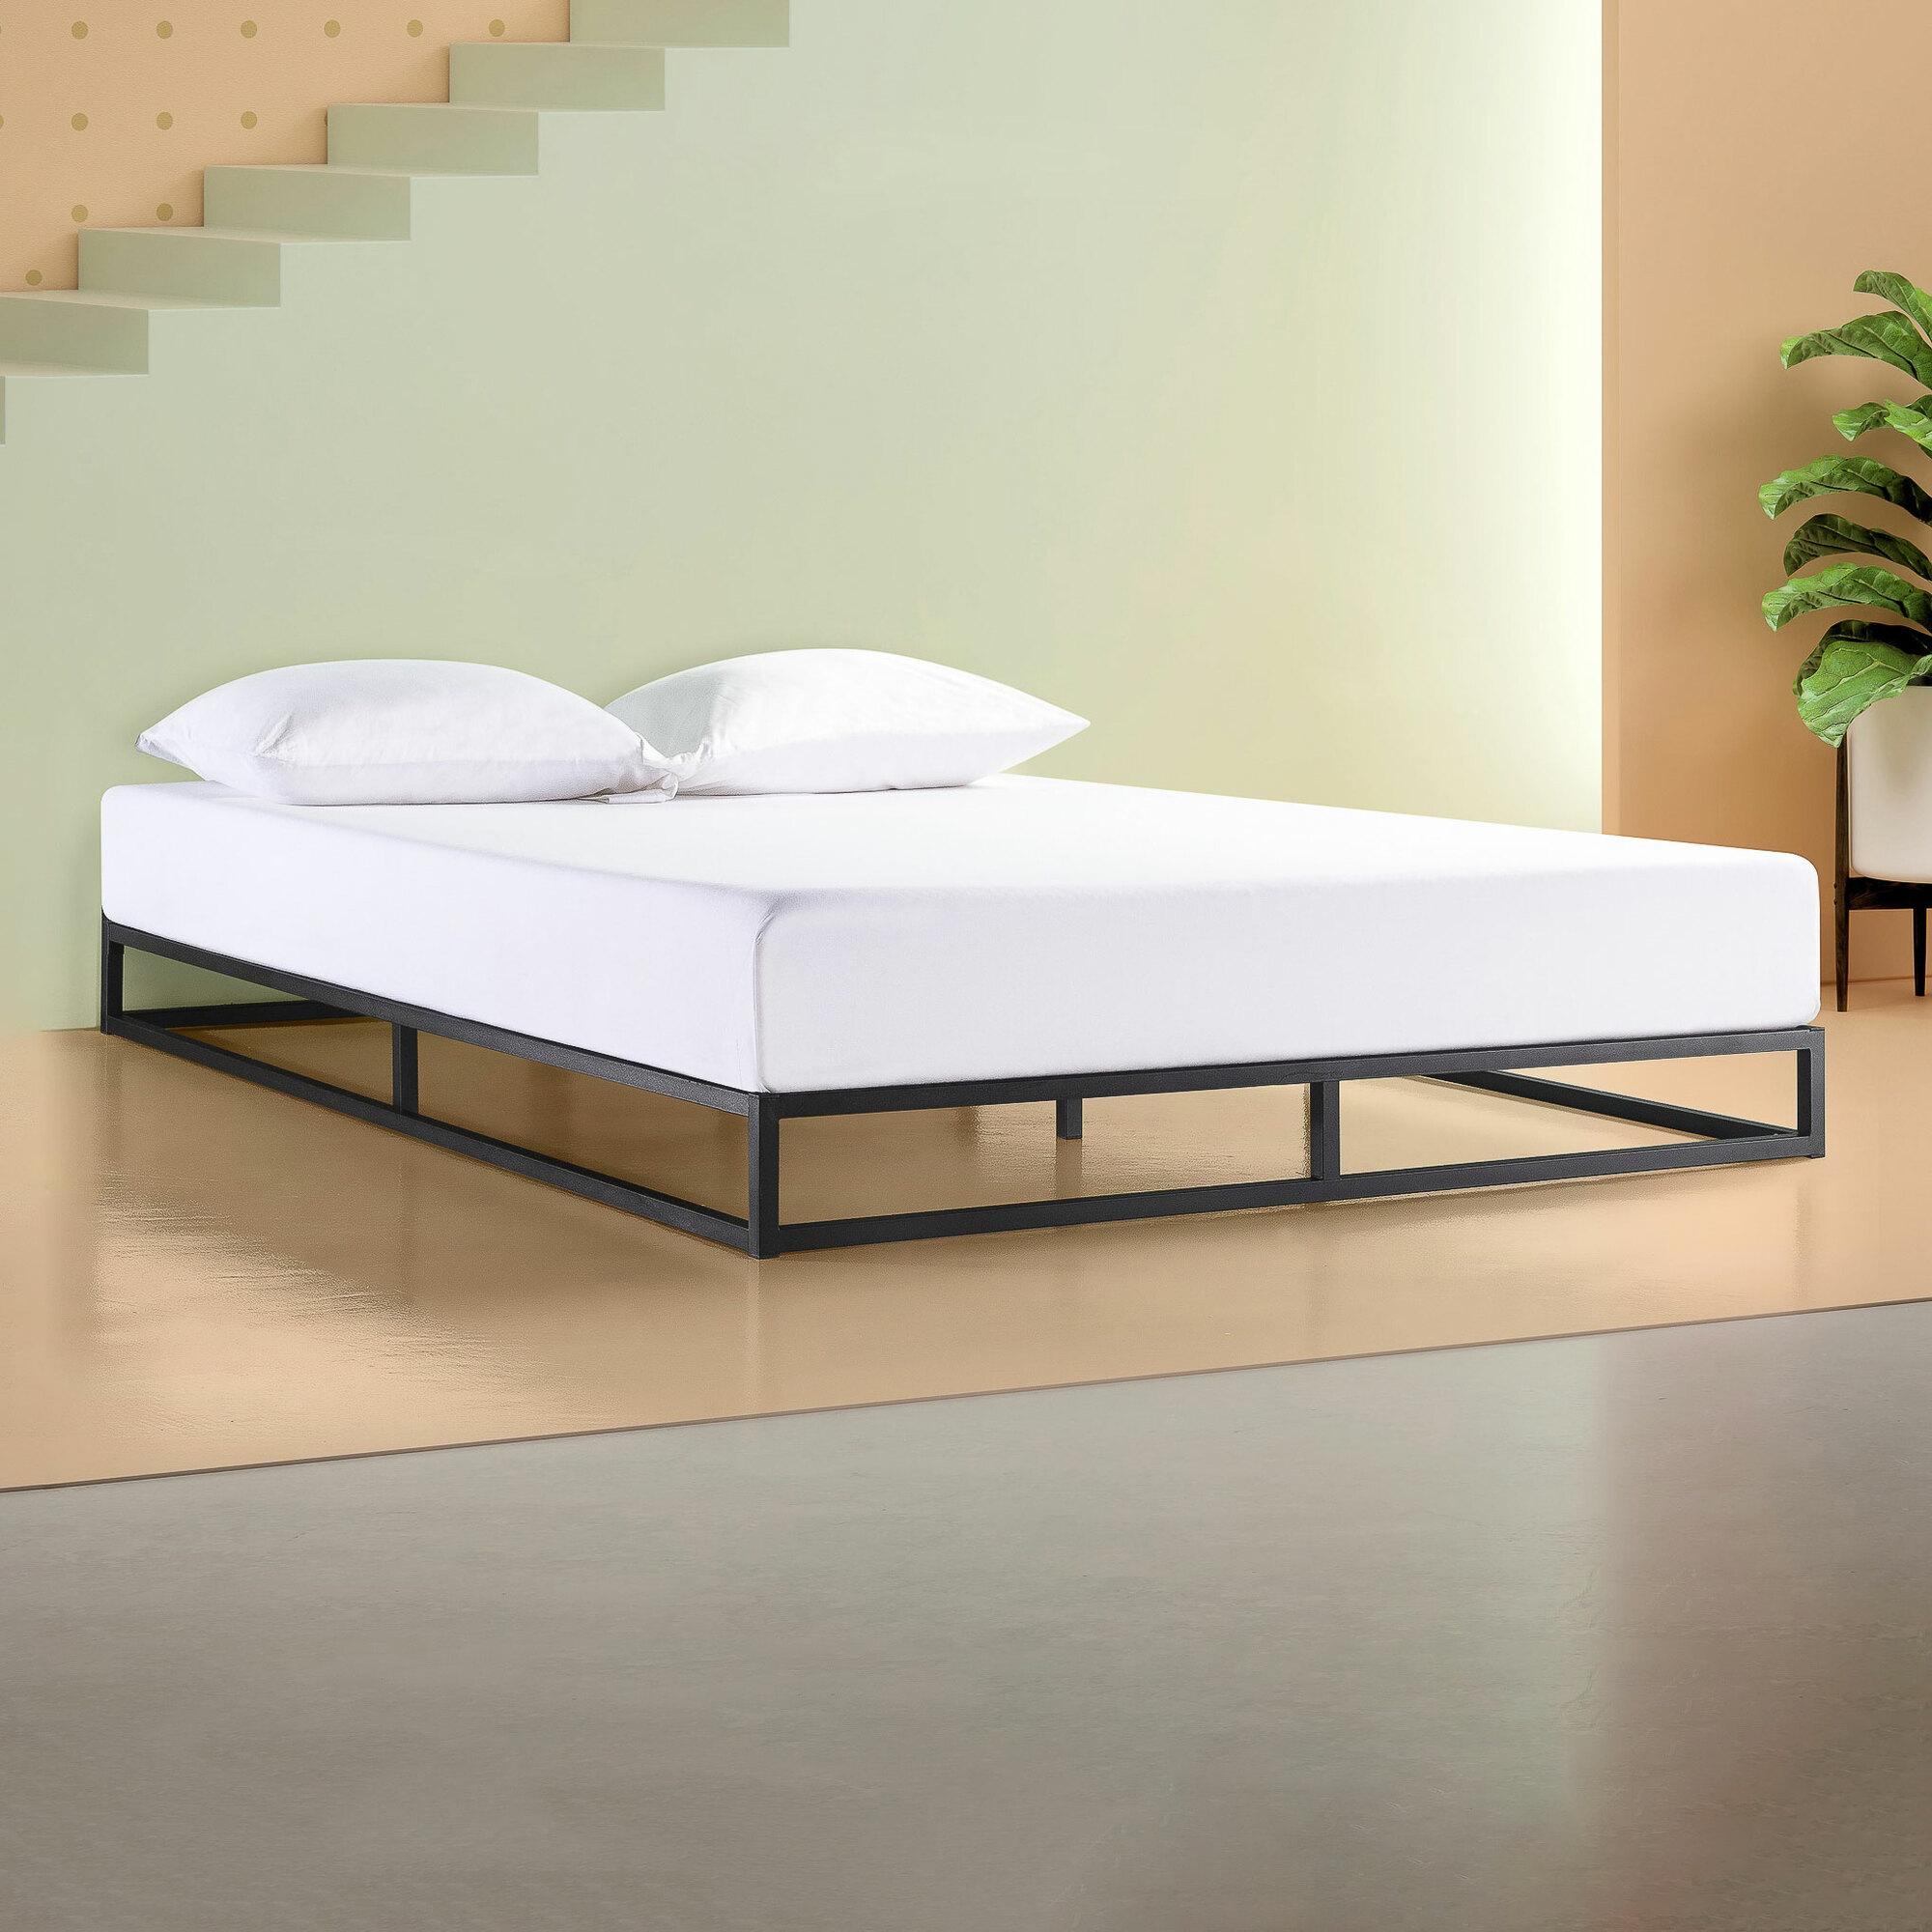 New Black Low Rise Pilato Bed Frame Studio Home Beds Ebay